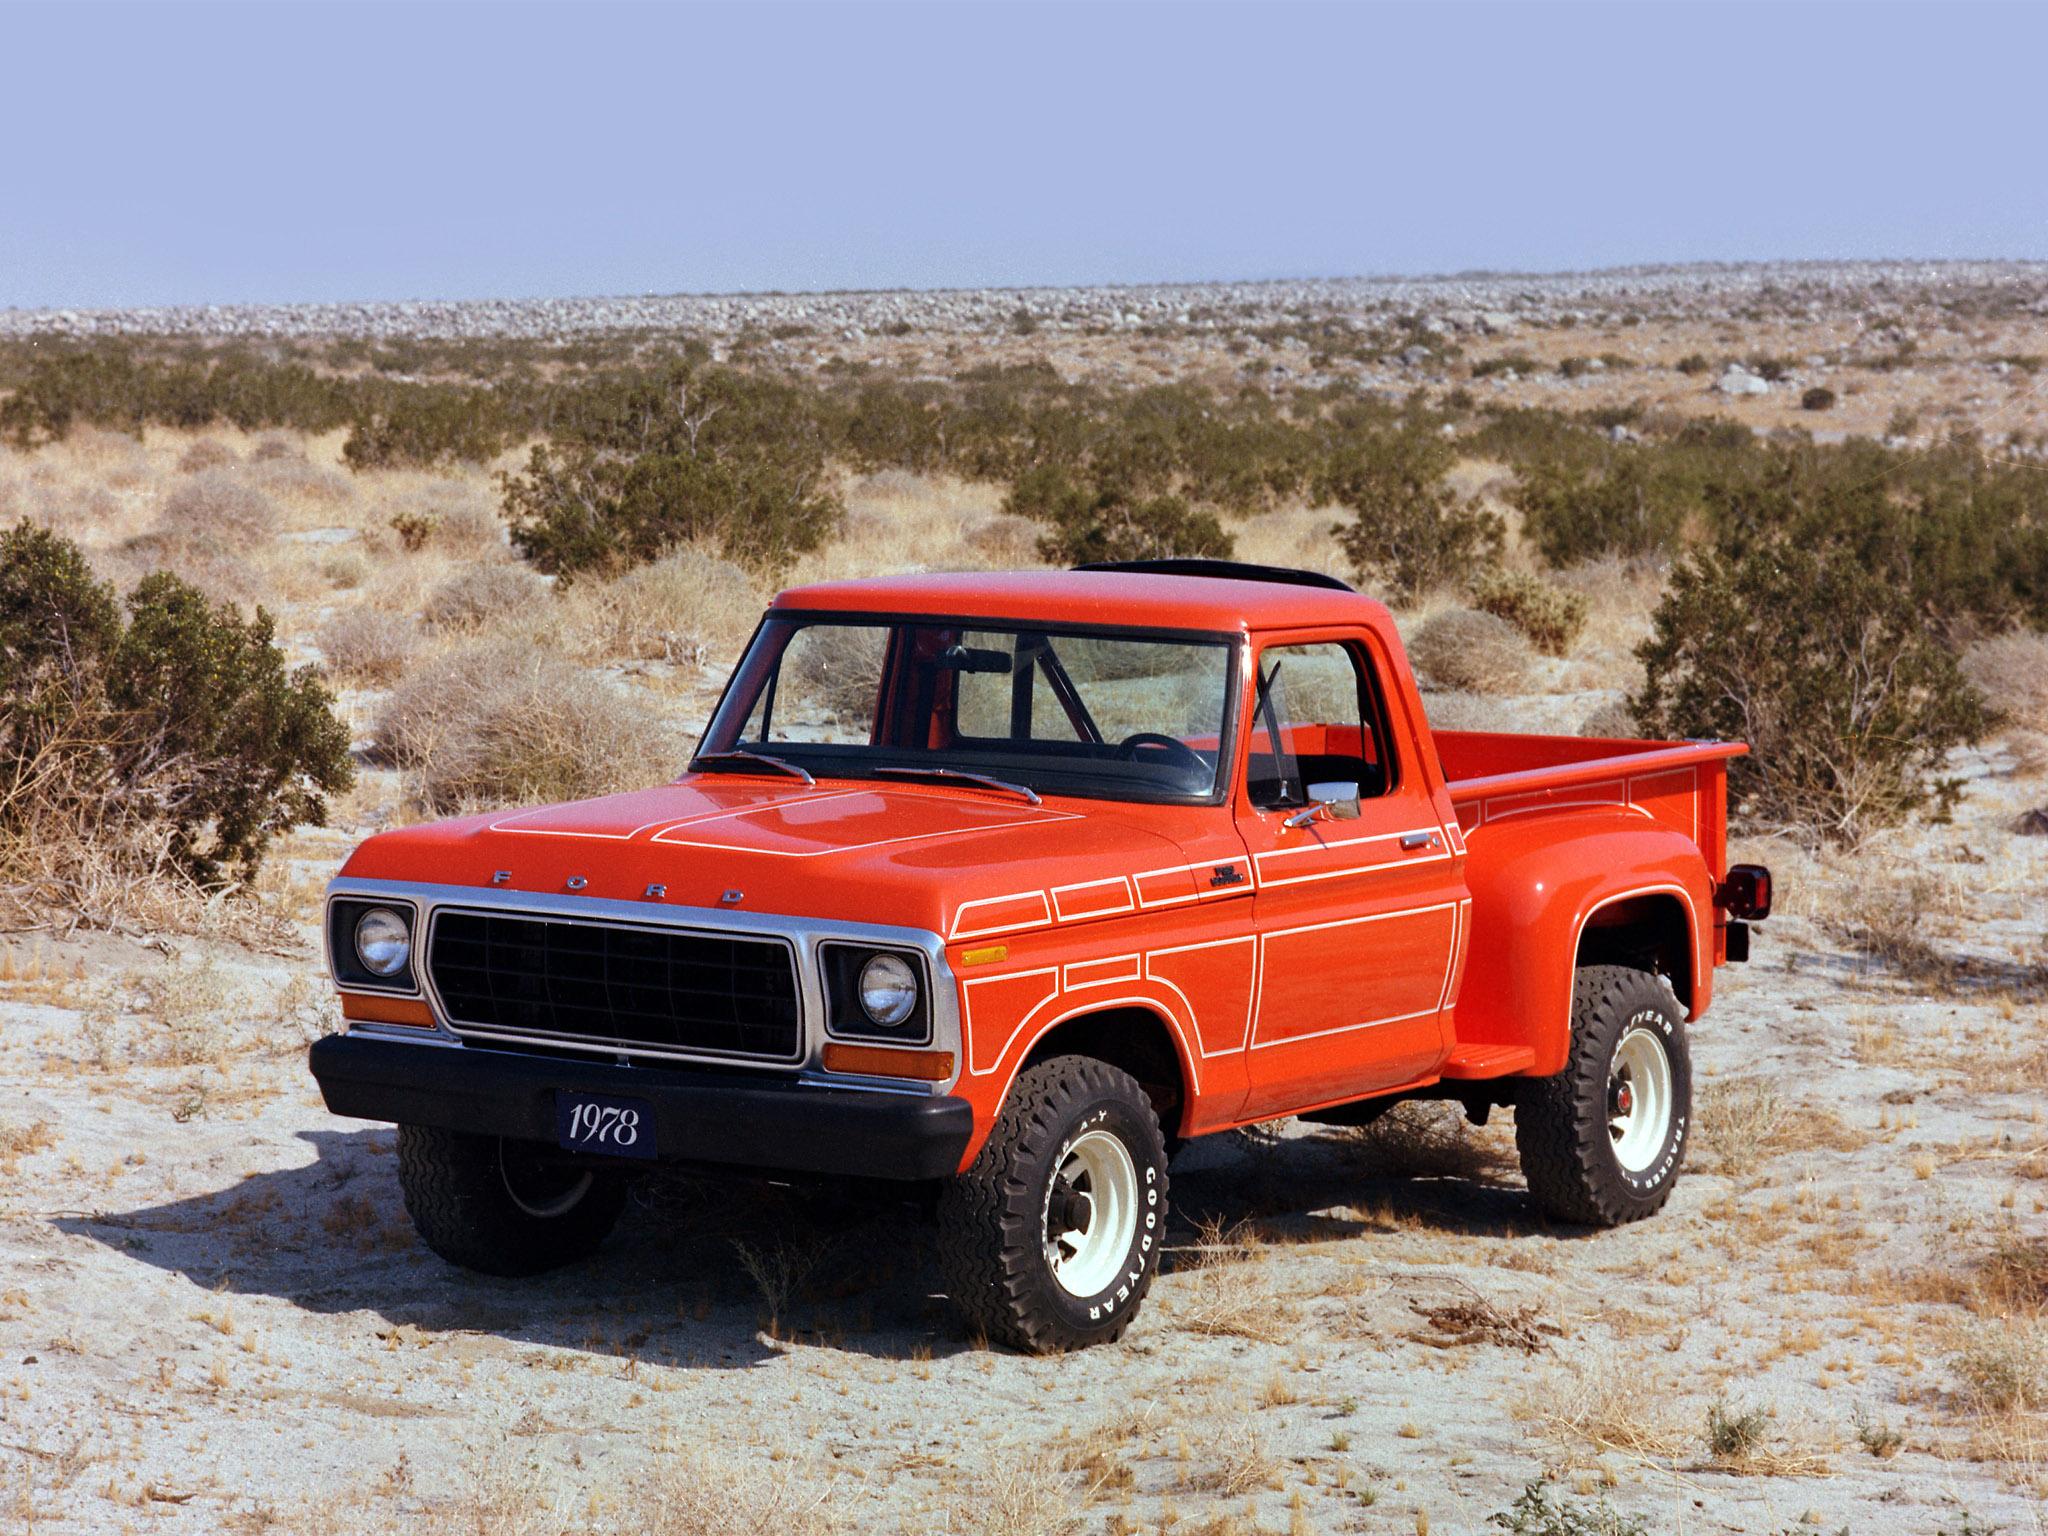 1978 Ford F 100 classic truck 4x4 wallpaper background 2048x1536